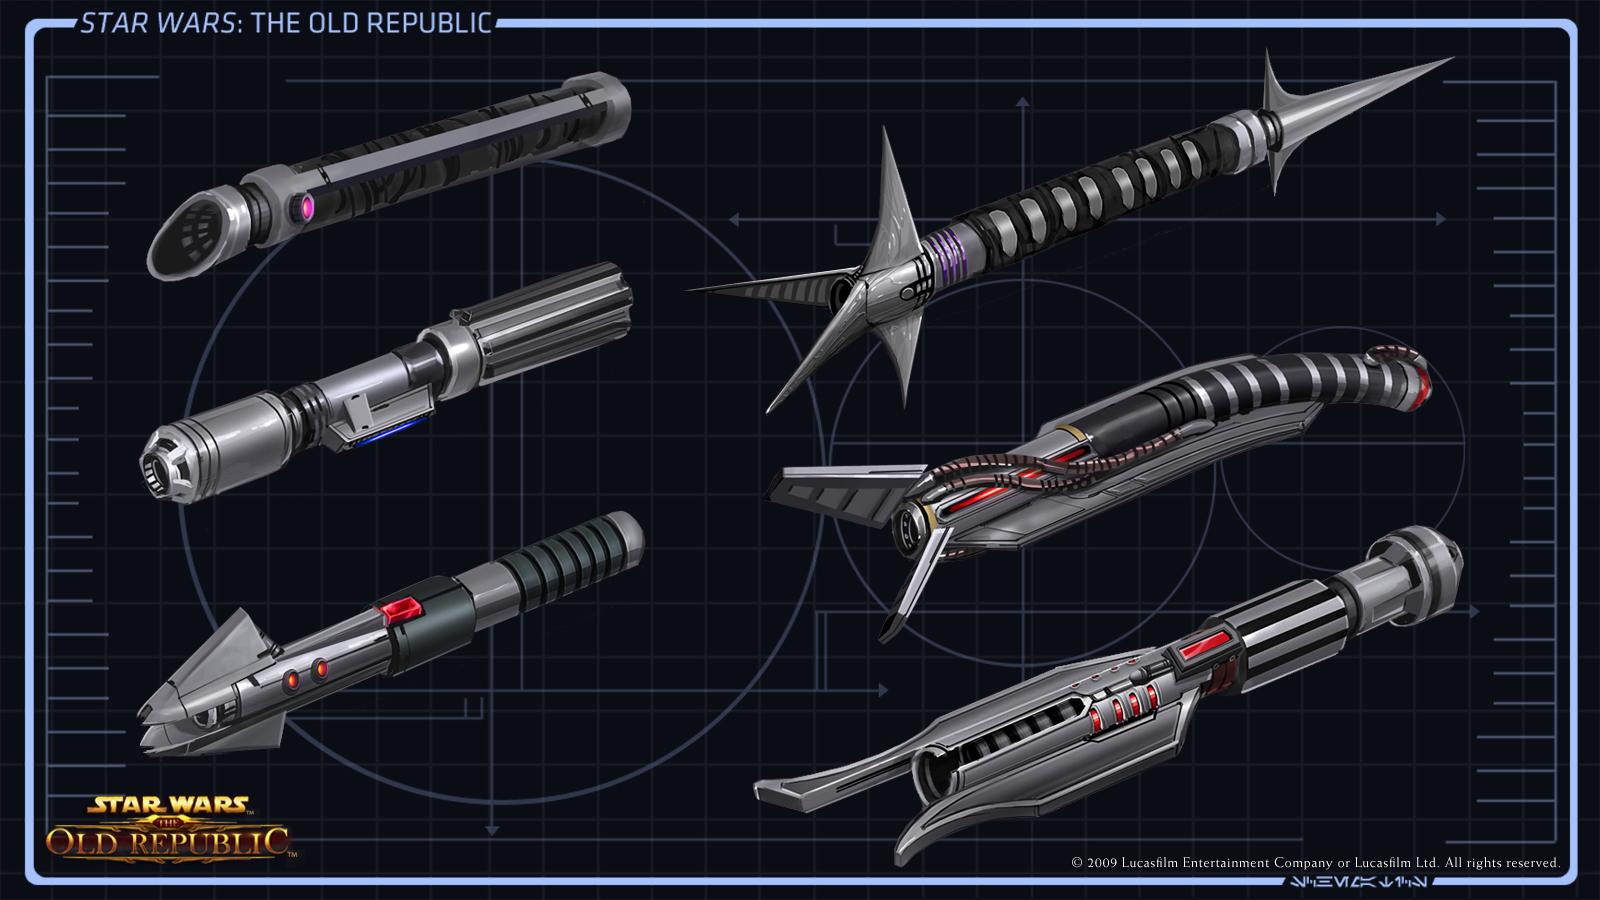 Image Ca3 1600x900 Jpg Star Wars The Old Republic